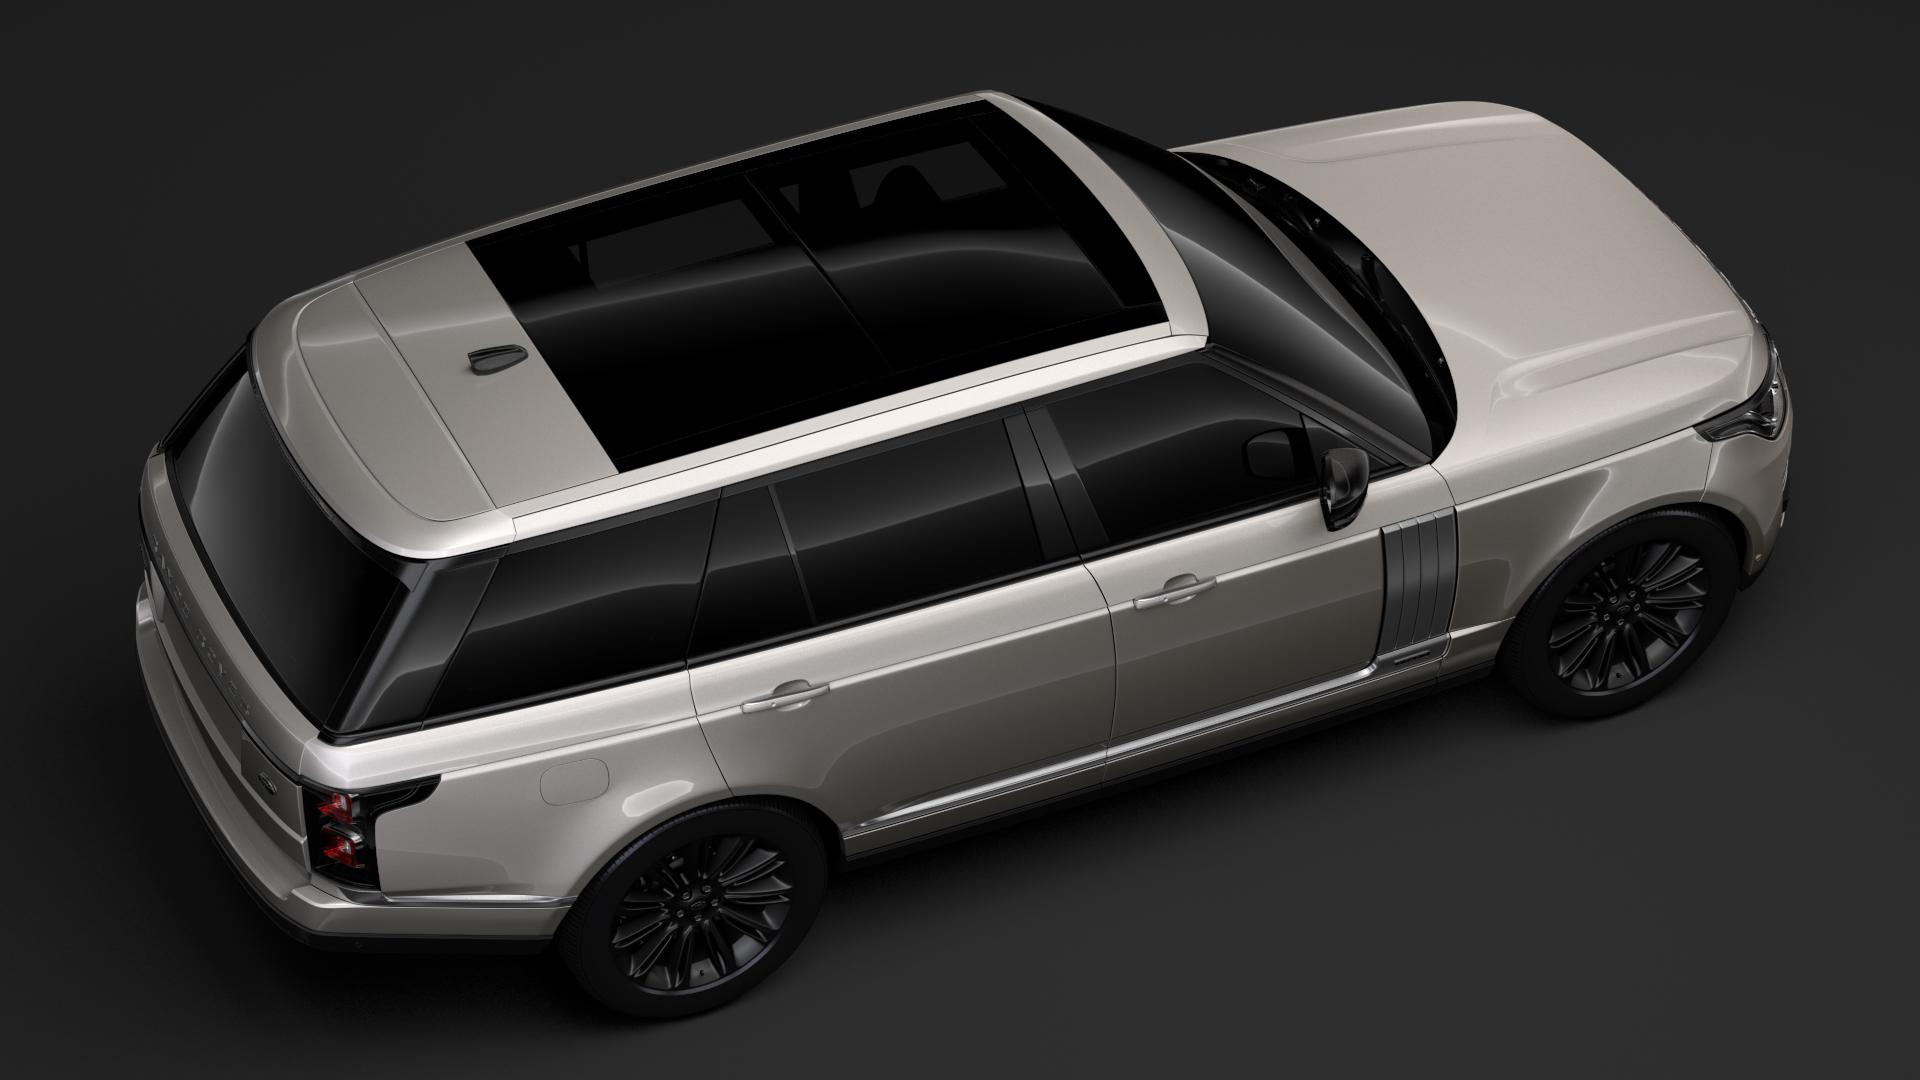 range rover autobiography hybrid lwb l405 2018 3d model flatpyramid. Black Bedroom Furniture Sets. Home Design Ideas